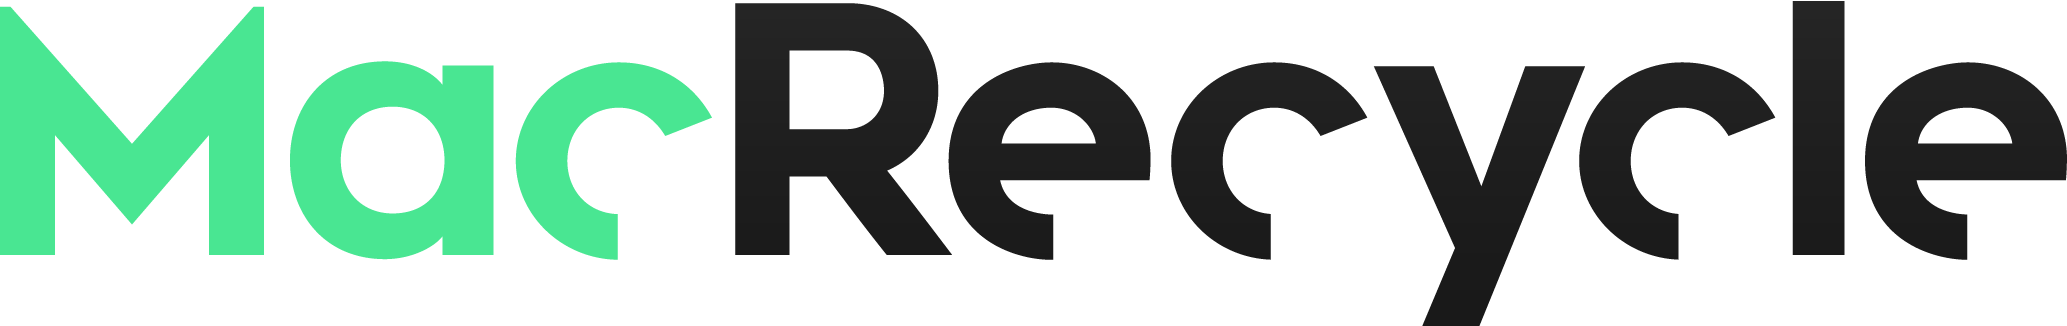 Mac Recycle Logo